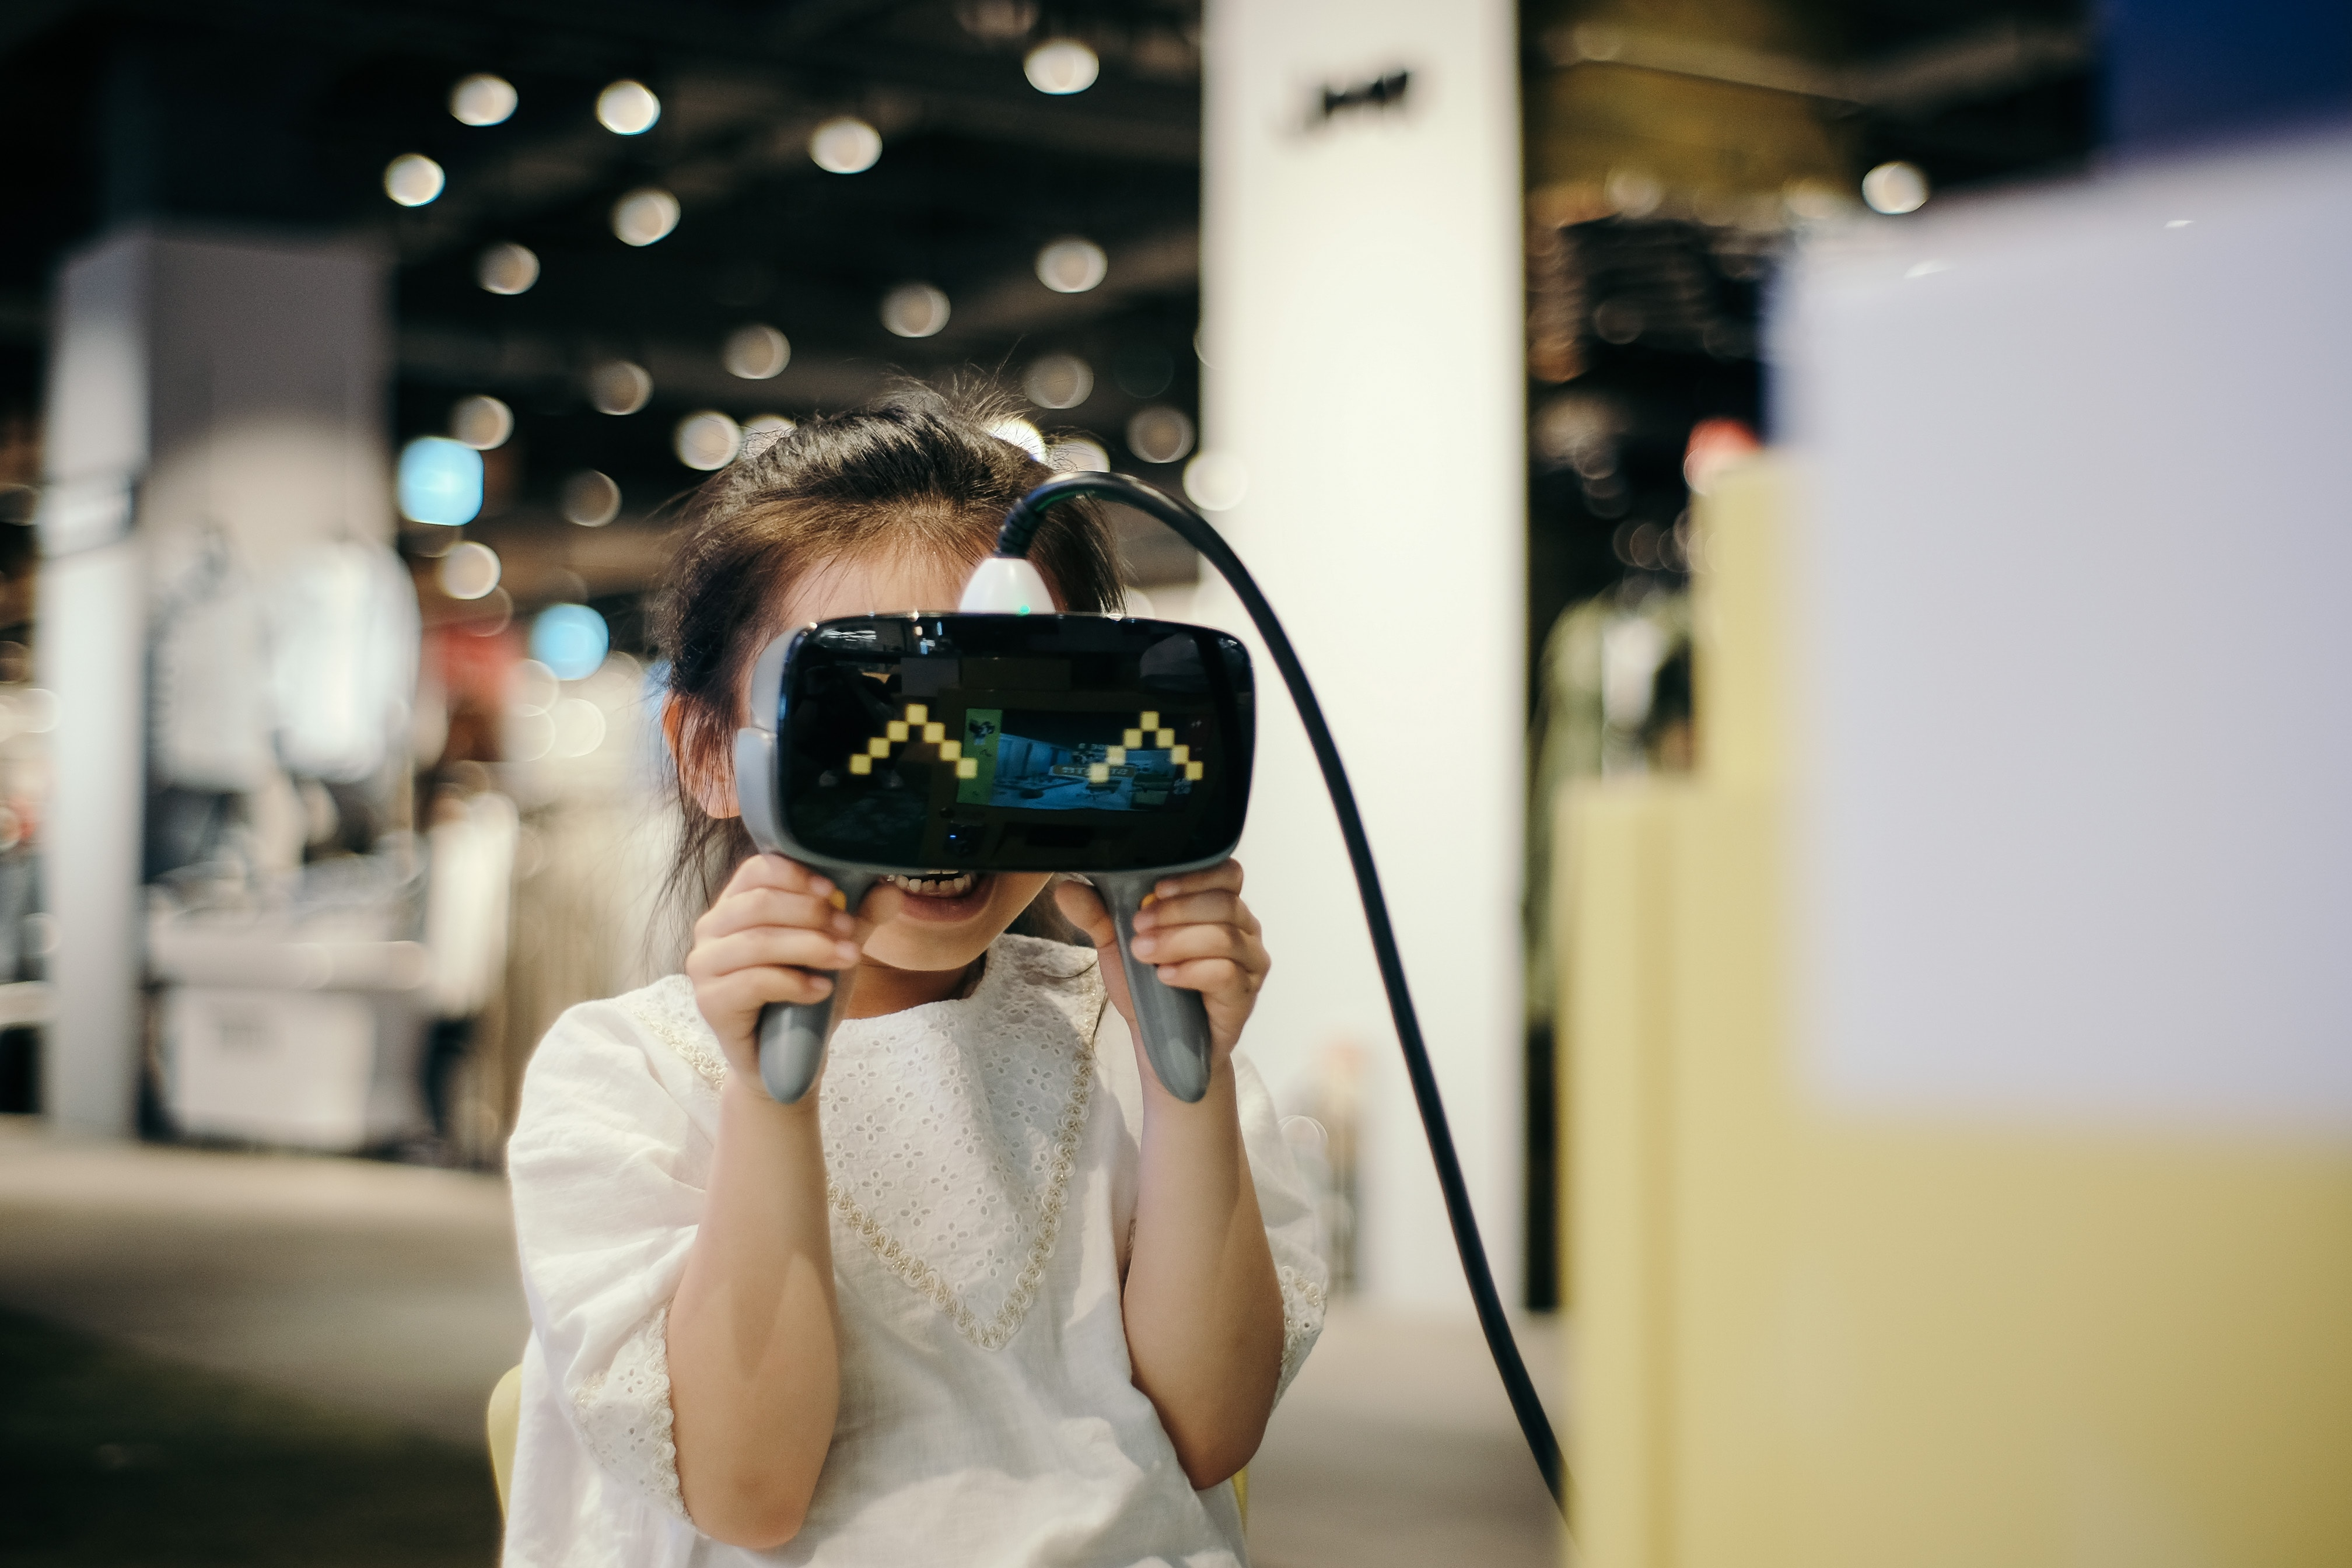 Realidad Virtual Y Entretenimiento 7 | Virtual Reality And Entertainment 7